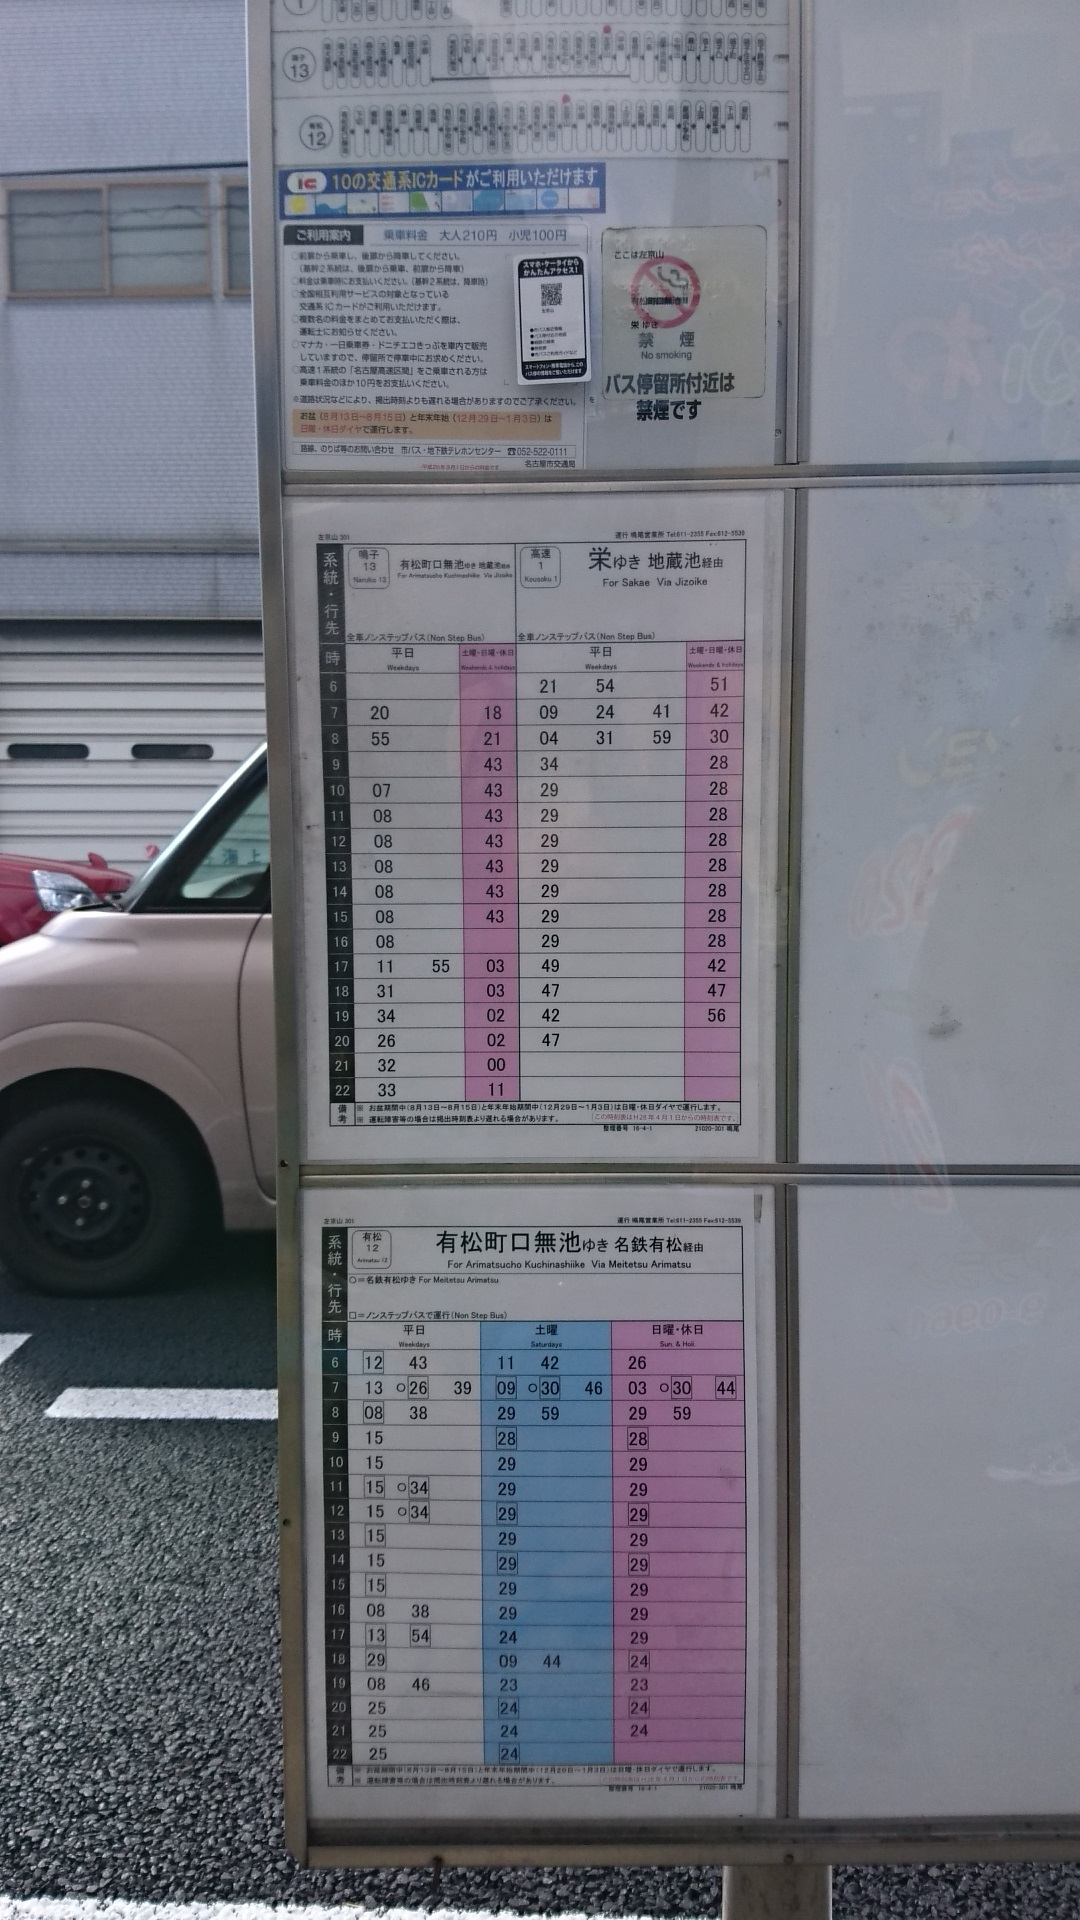 2017.2.2 左京山 (6) バス停時刻表 1080-1920